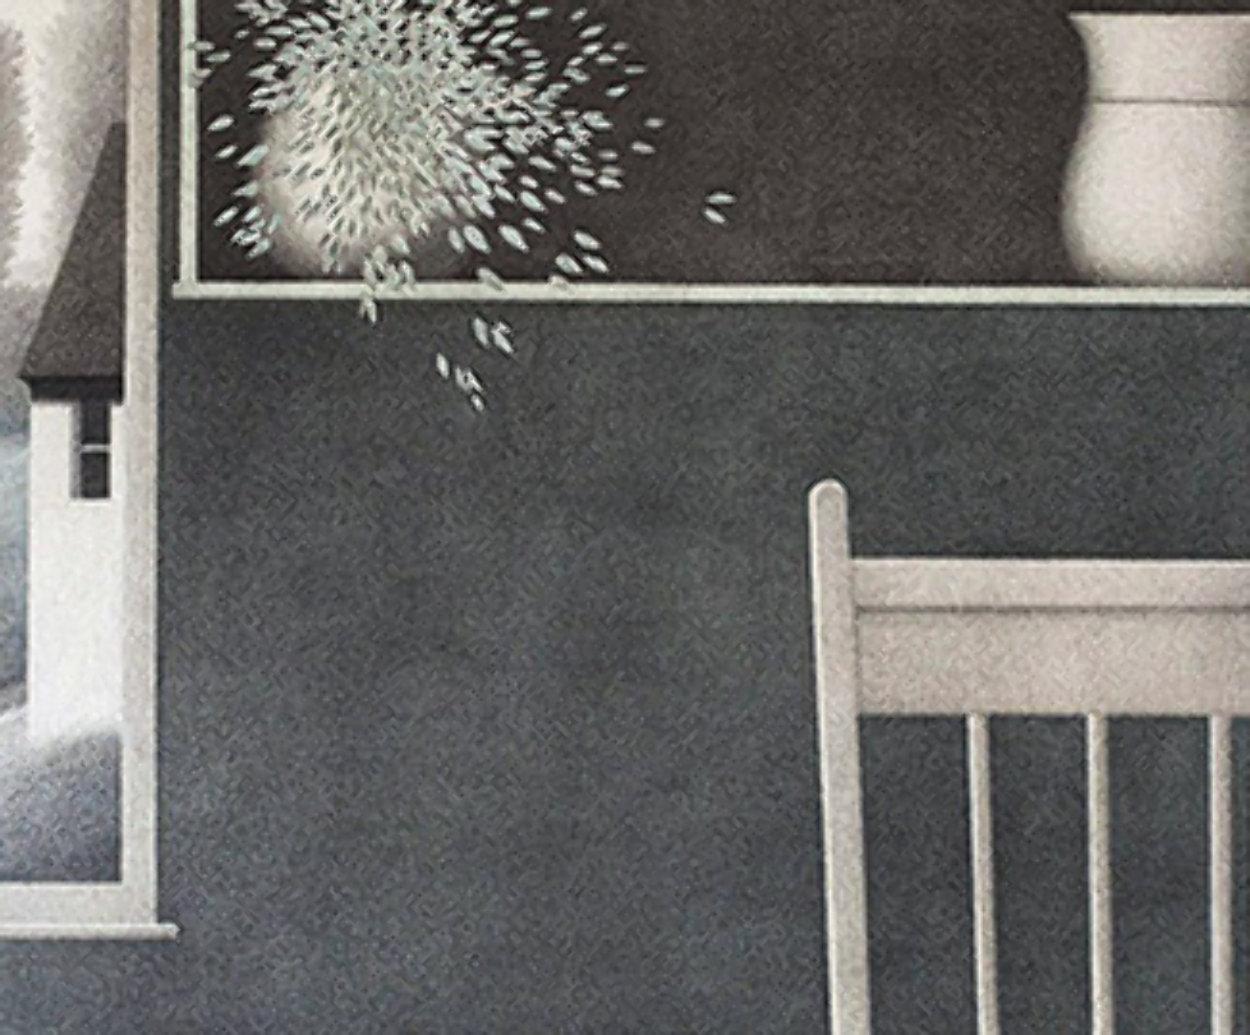 Interlude 1981 Limited Edition Print by Robert Kipniss